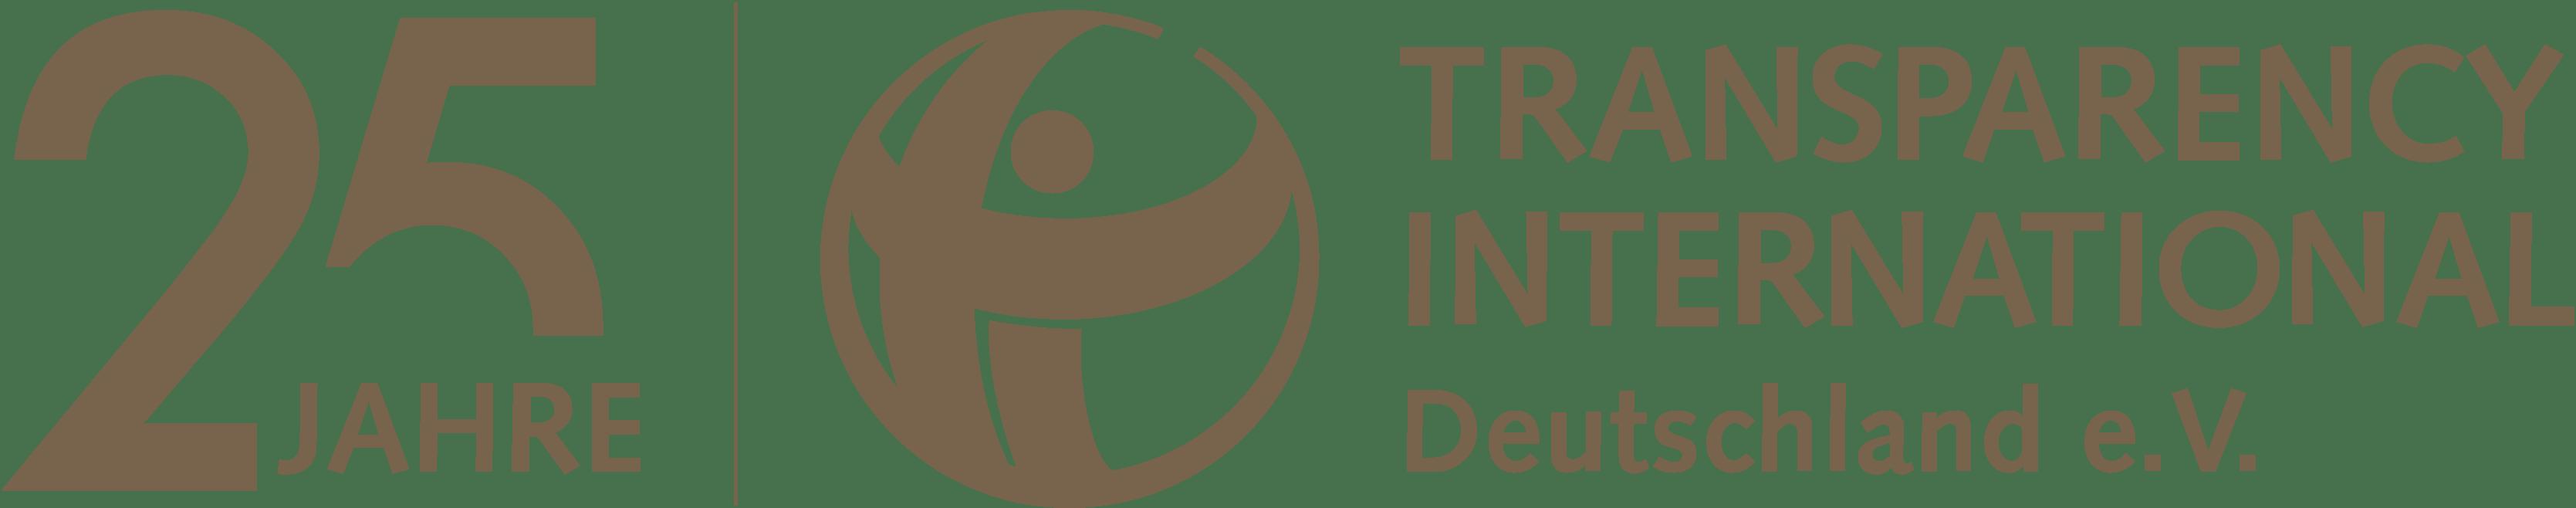 Transparency International Deutschland e.V.